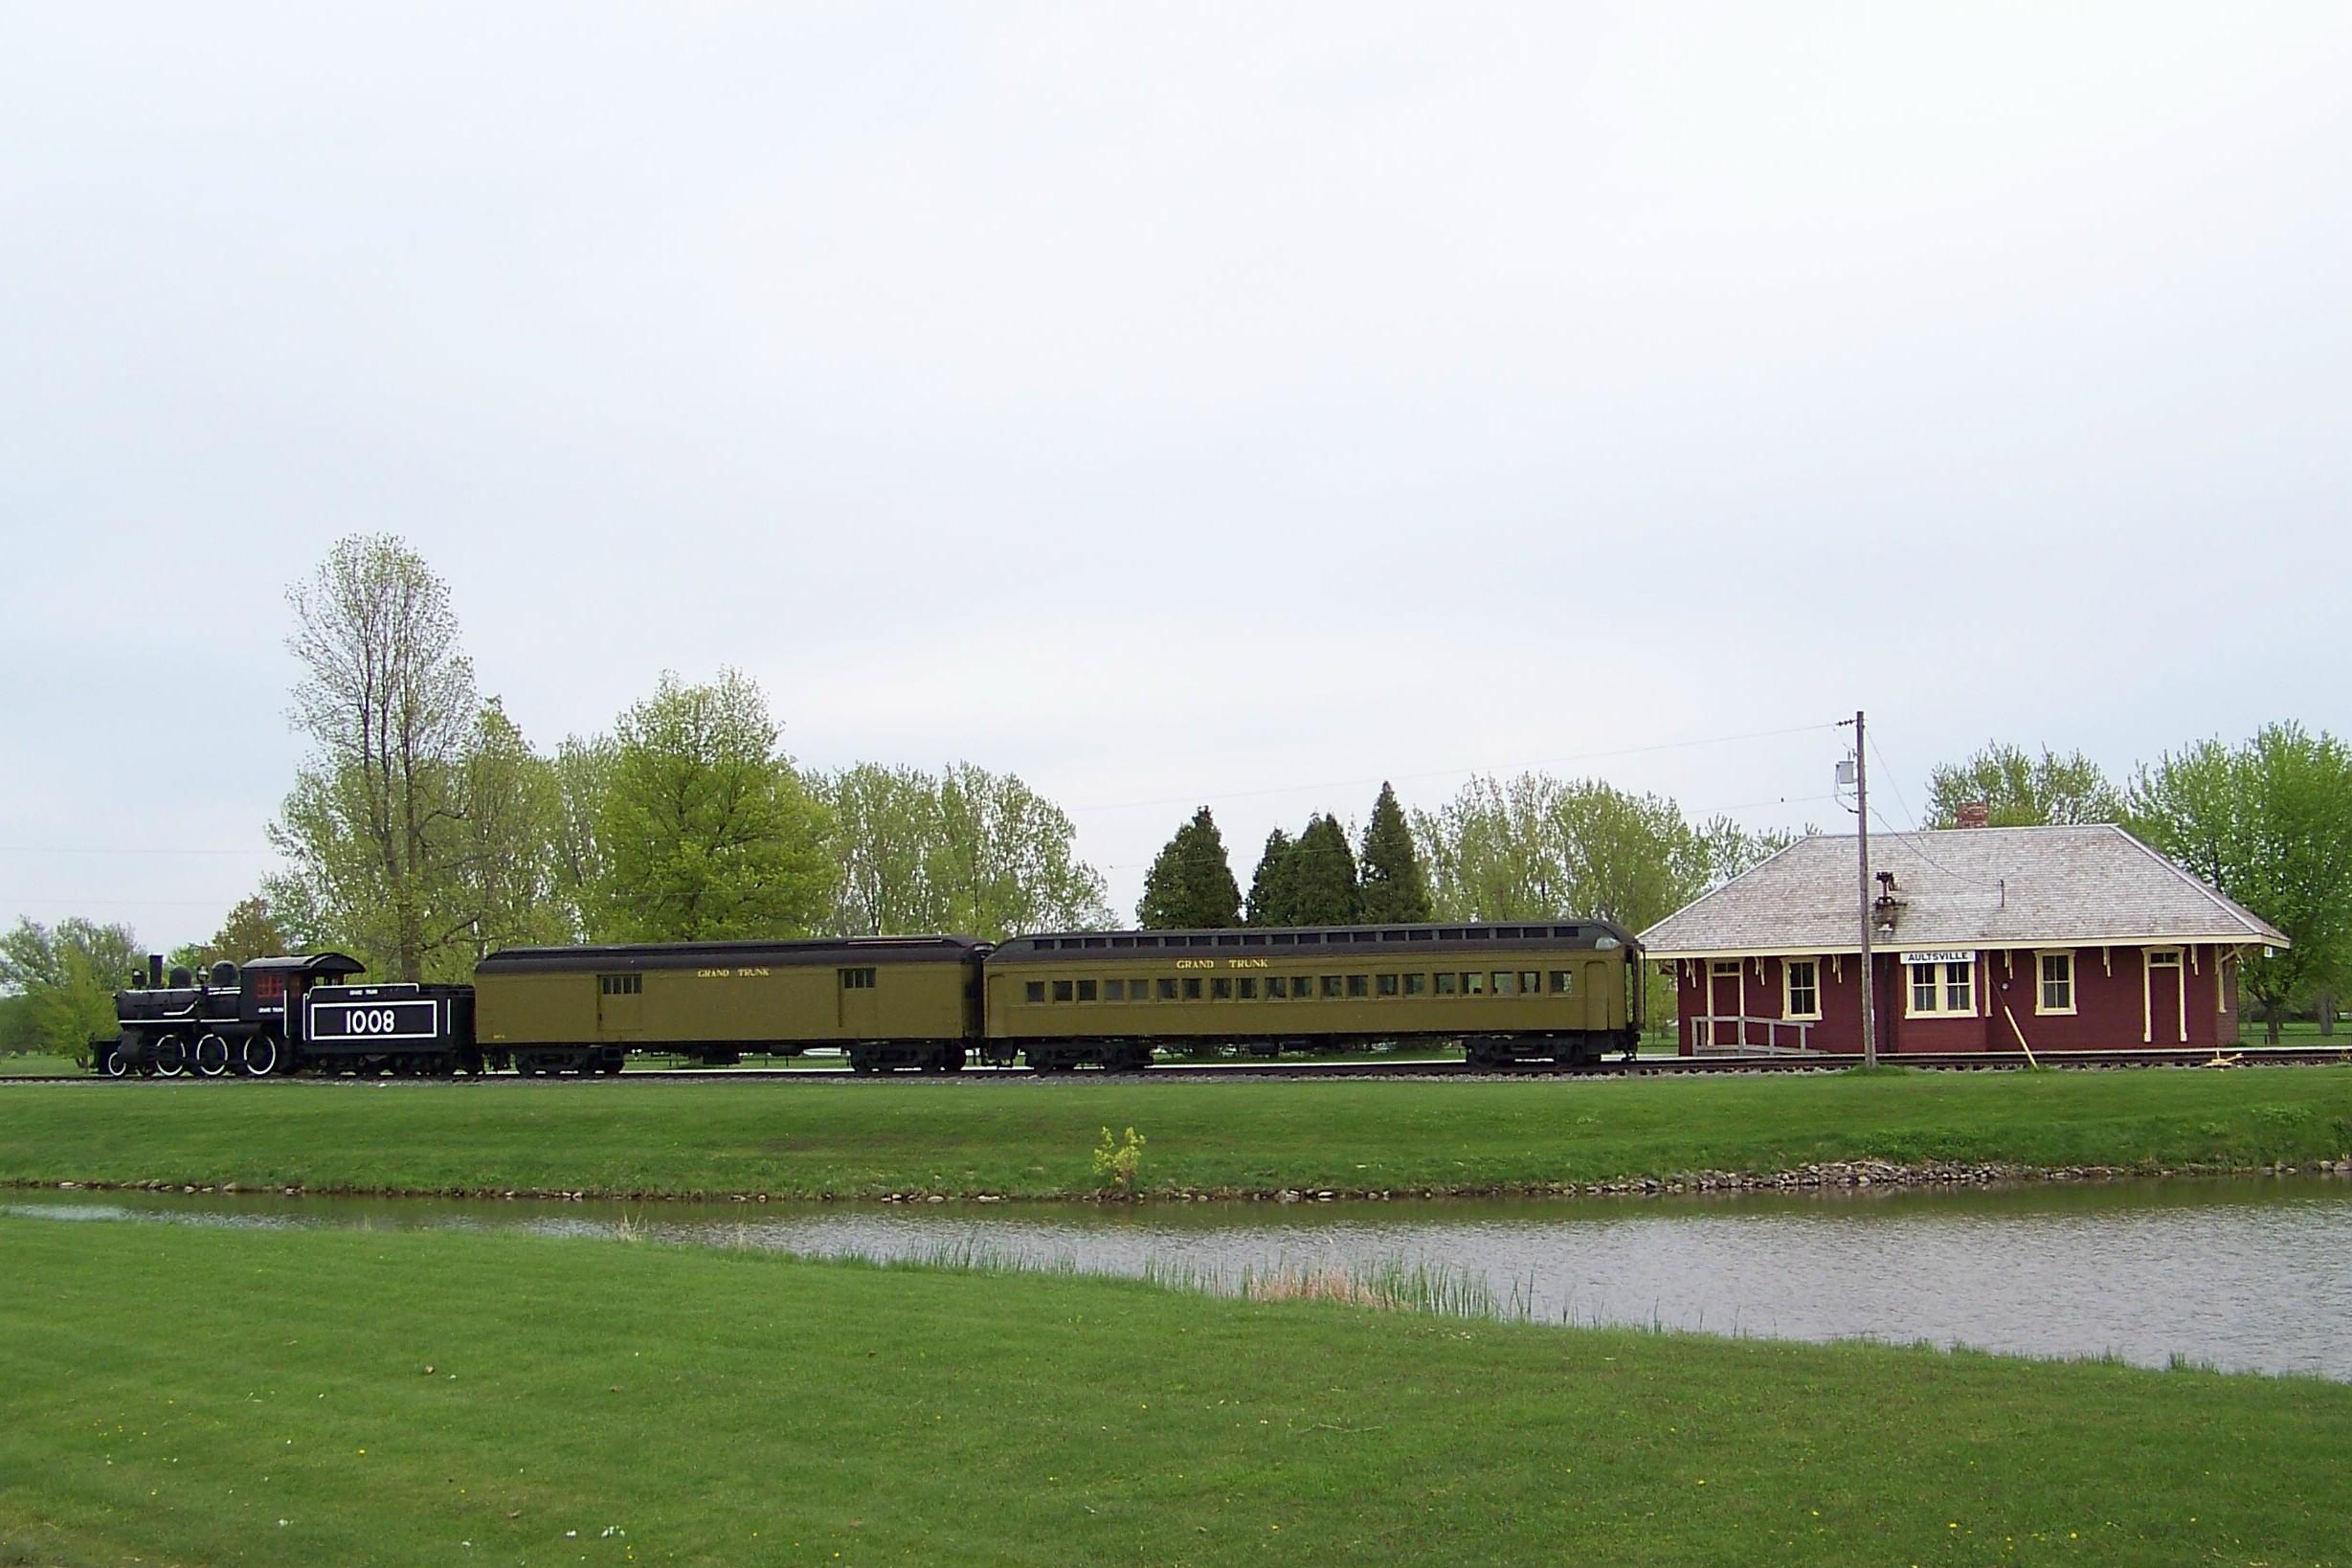 Aultsvillestation